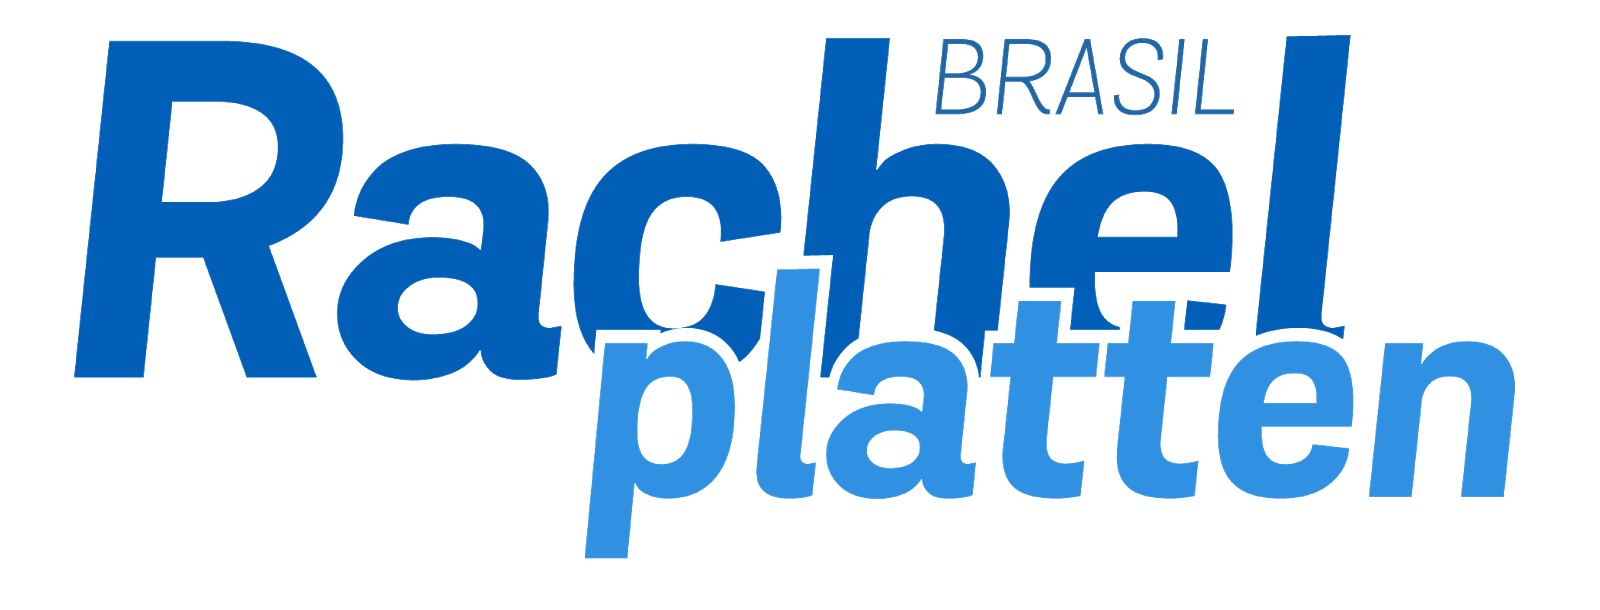 Rachel Platten Brasil